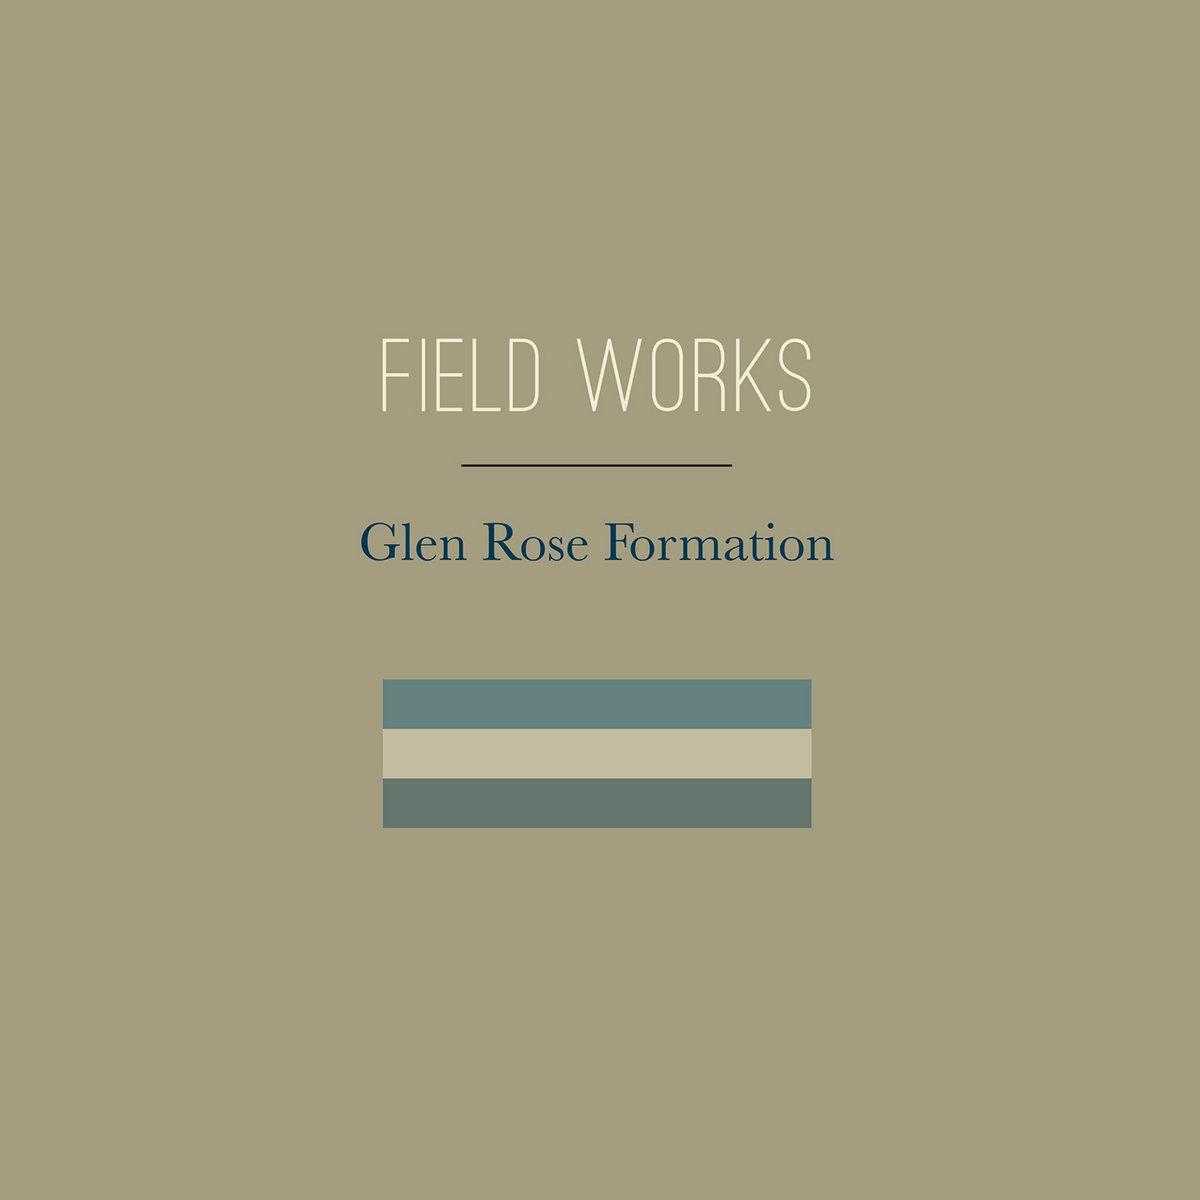 Glen Rose- remix of